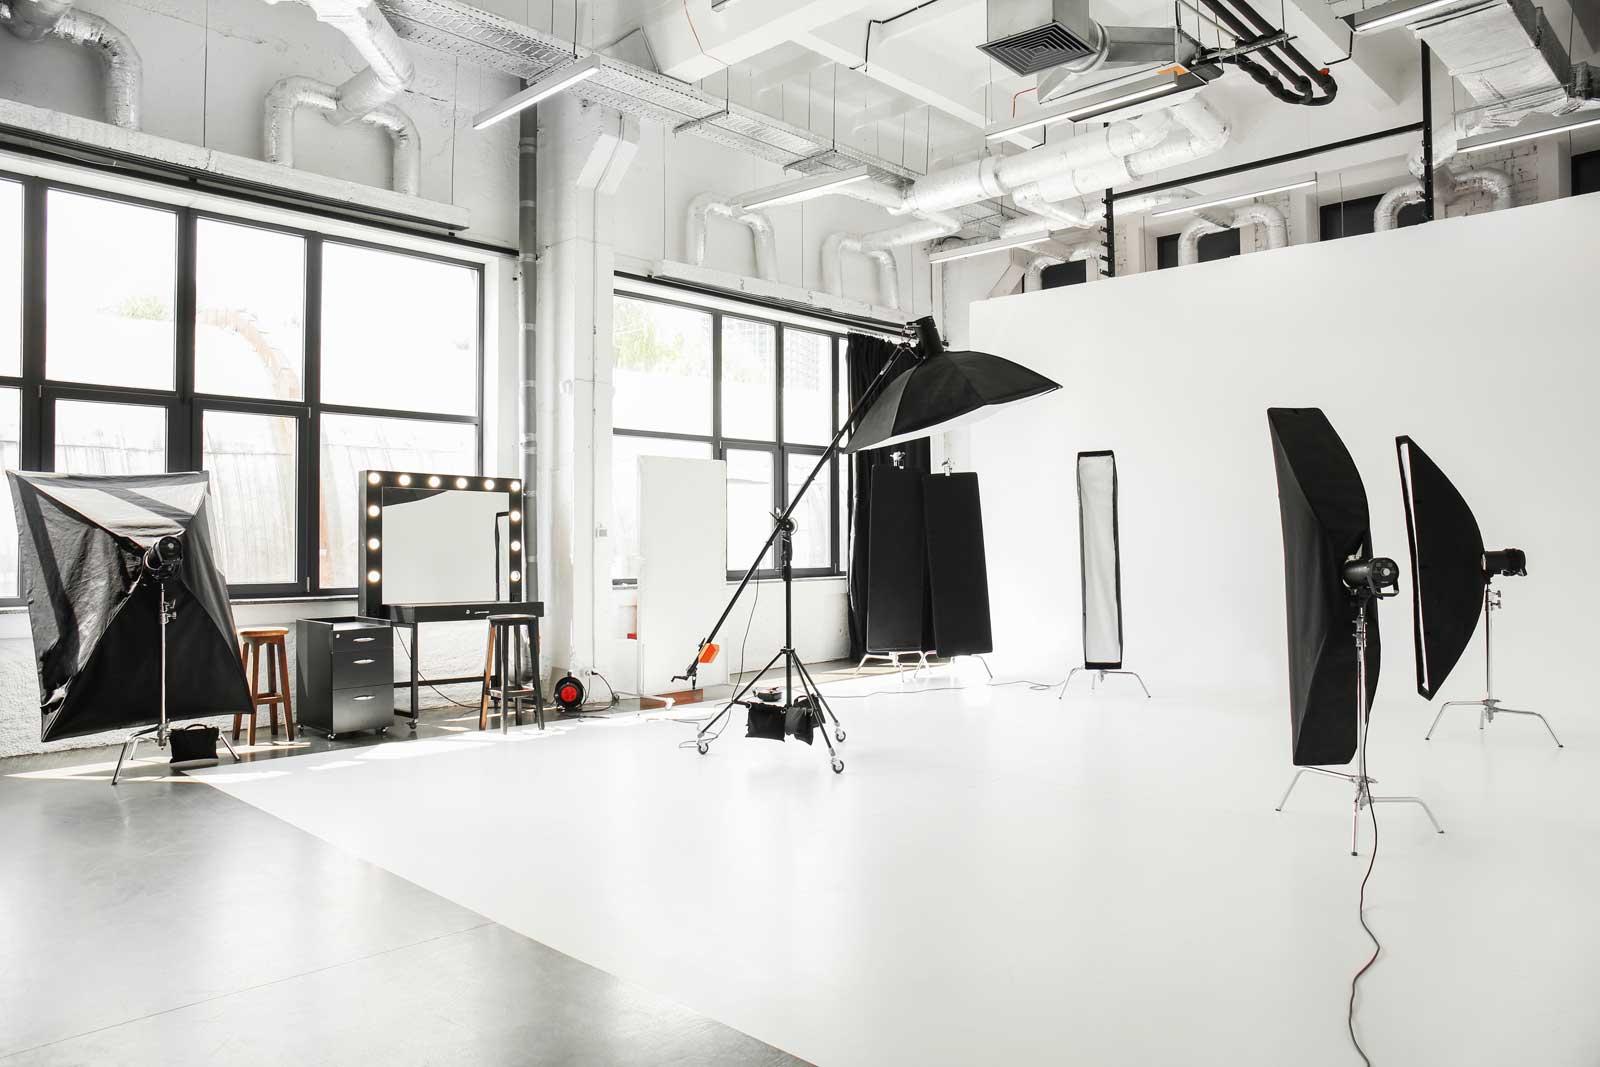 Unternehmens-Fotografie Fotoshooting People Fotografie Webdesign Onlineshop Homepage Webseite Corporate Website Grafik Design Fotografie Bildbearbeitung ShowMyProject Digital Agentur Basel 2021